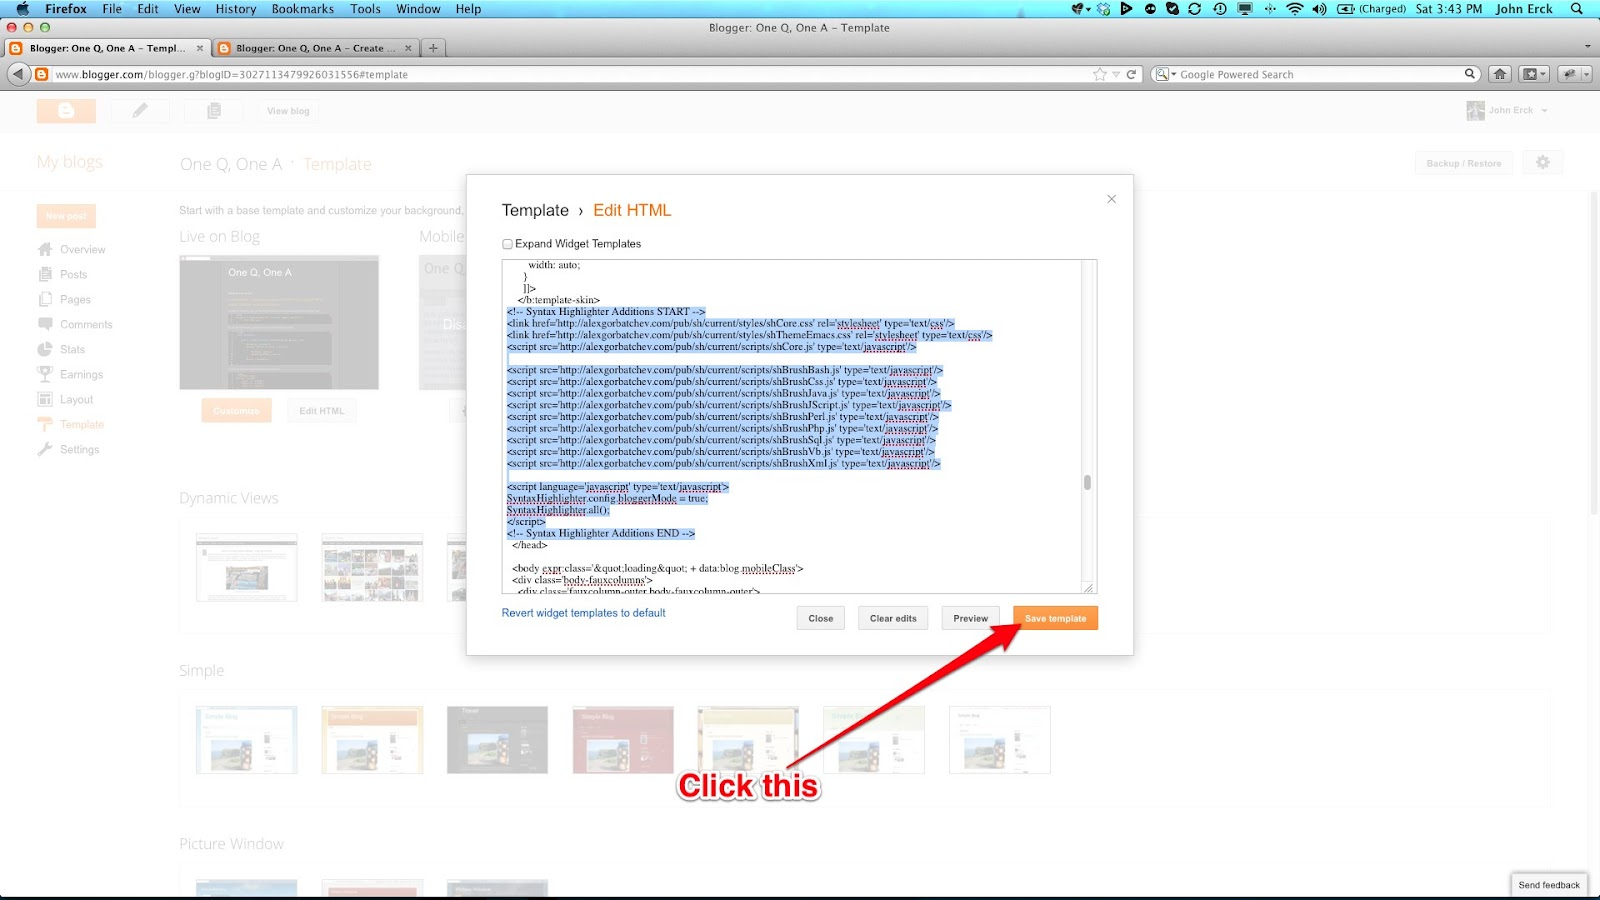 "Syntax Highlighter Additions START --link href=""http://alexgorbatchev.com/pub/sh/current/styles/shCore.css"" rel..."